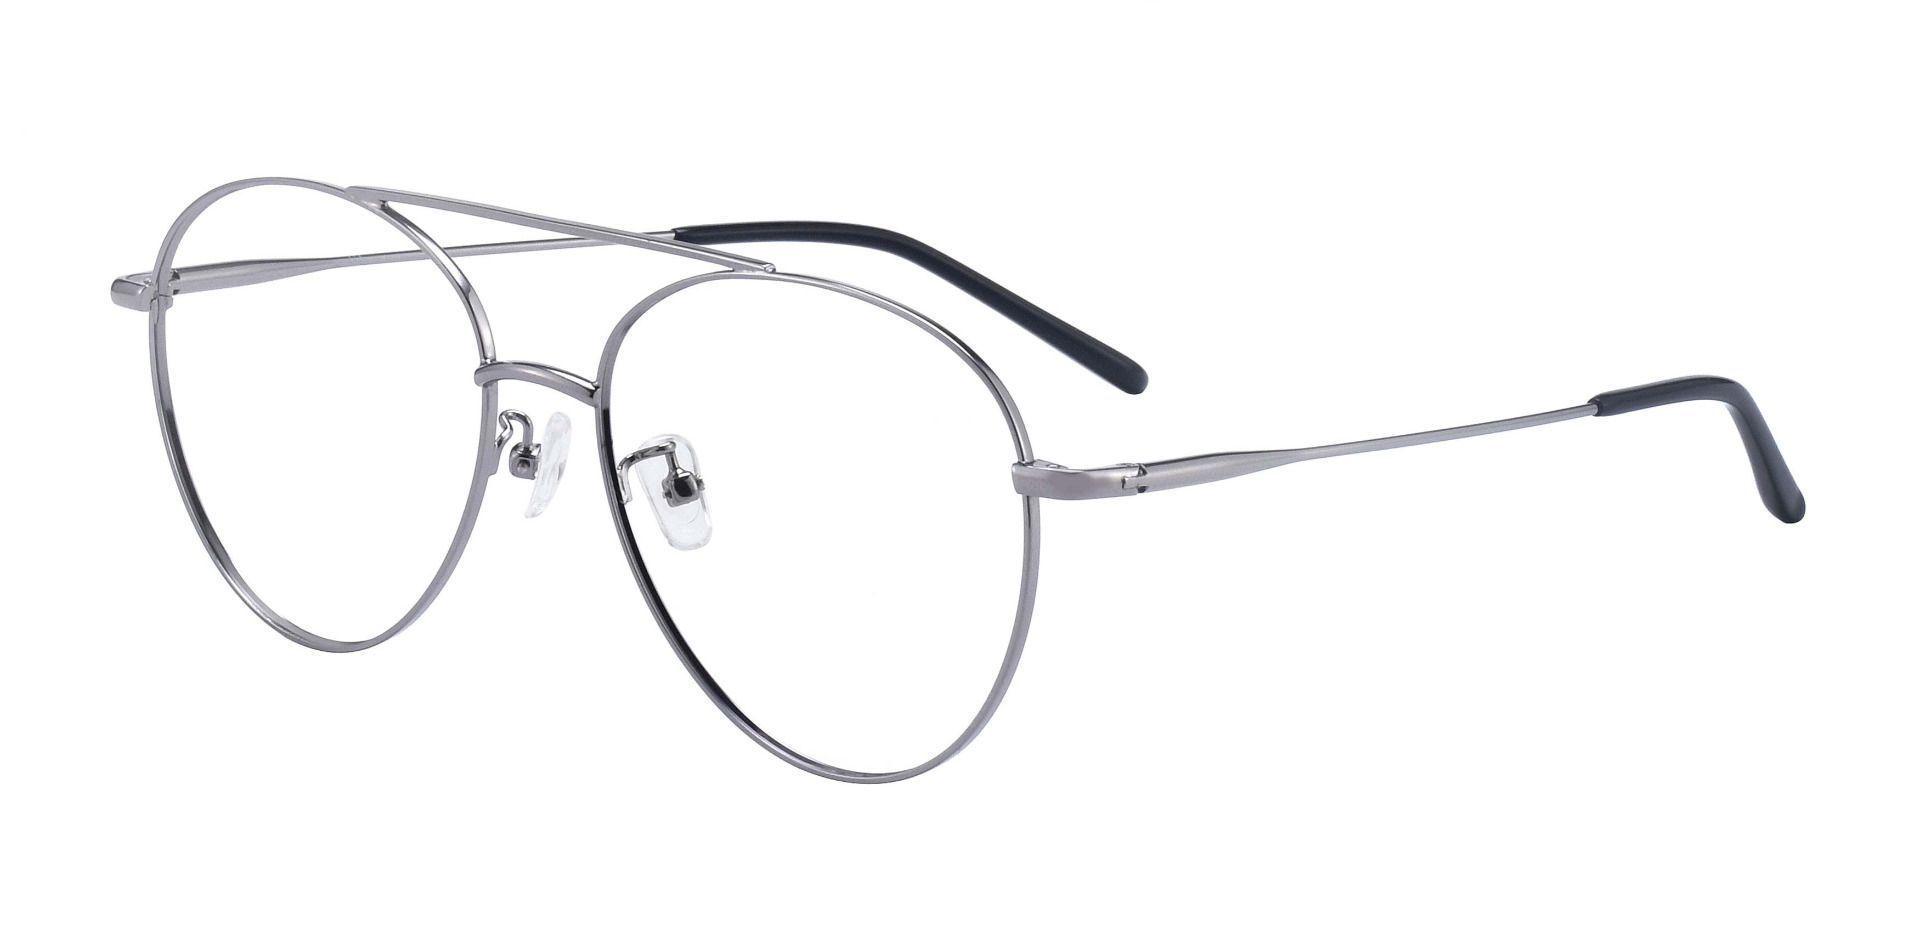 Hopper Aviator Prescription Glasses - Gunmetal